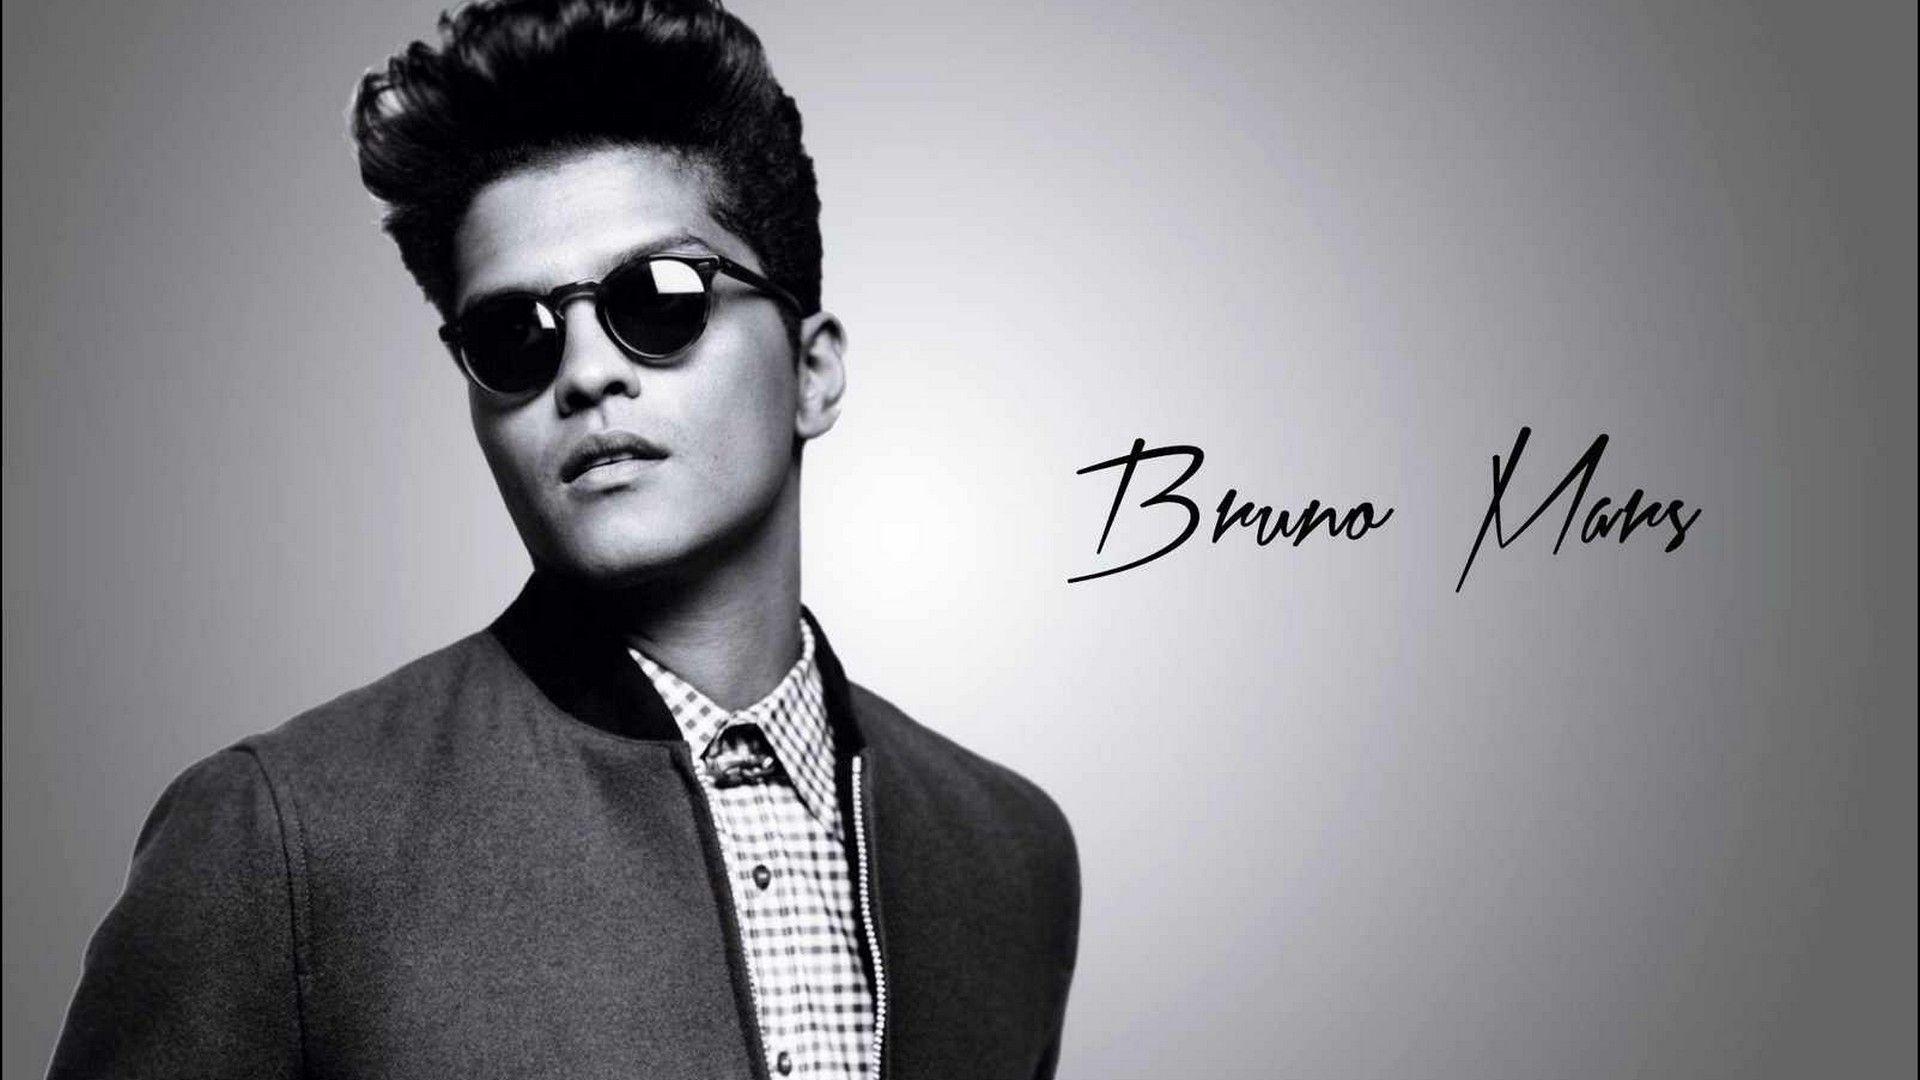 Bruno Mars Wallpaper Background 2021 Live Wallpaper Hd Mars Wallpaper Bruno Mars Bruno Mars Wallpaper